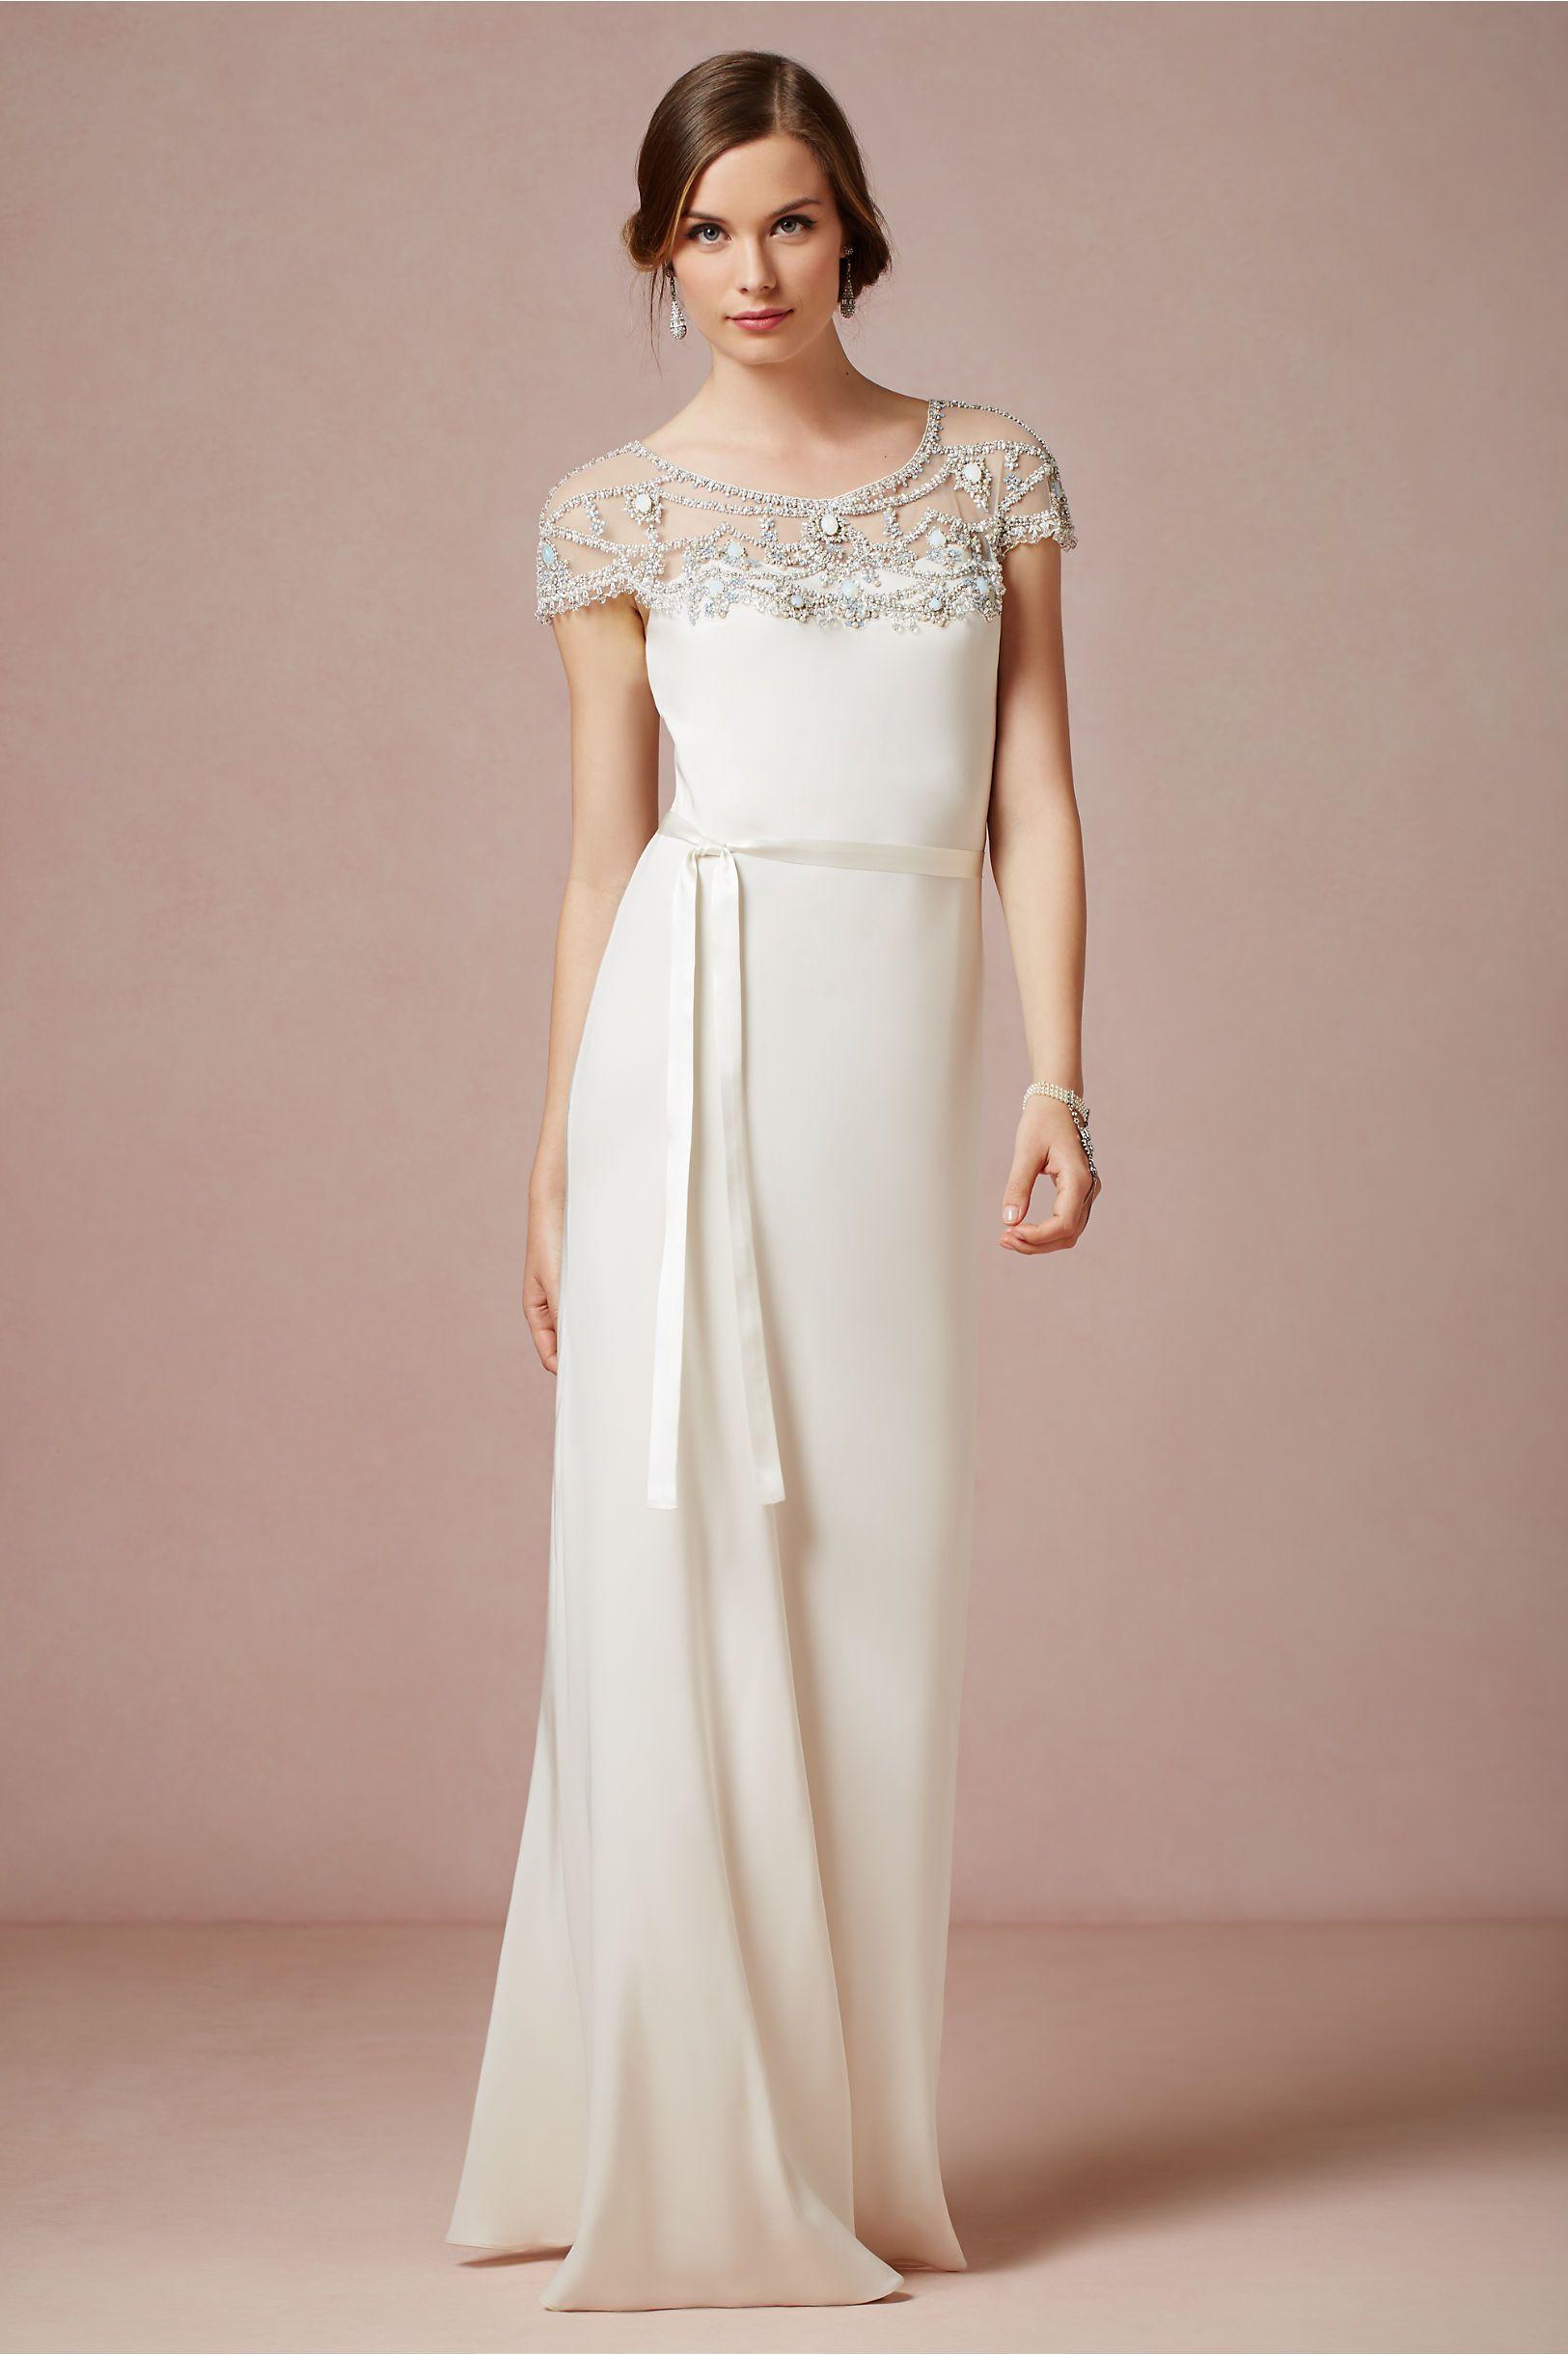 BHLDN Harlow Gown in Sale | BHLDN | Boda | Pinterest | Novios ...